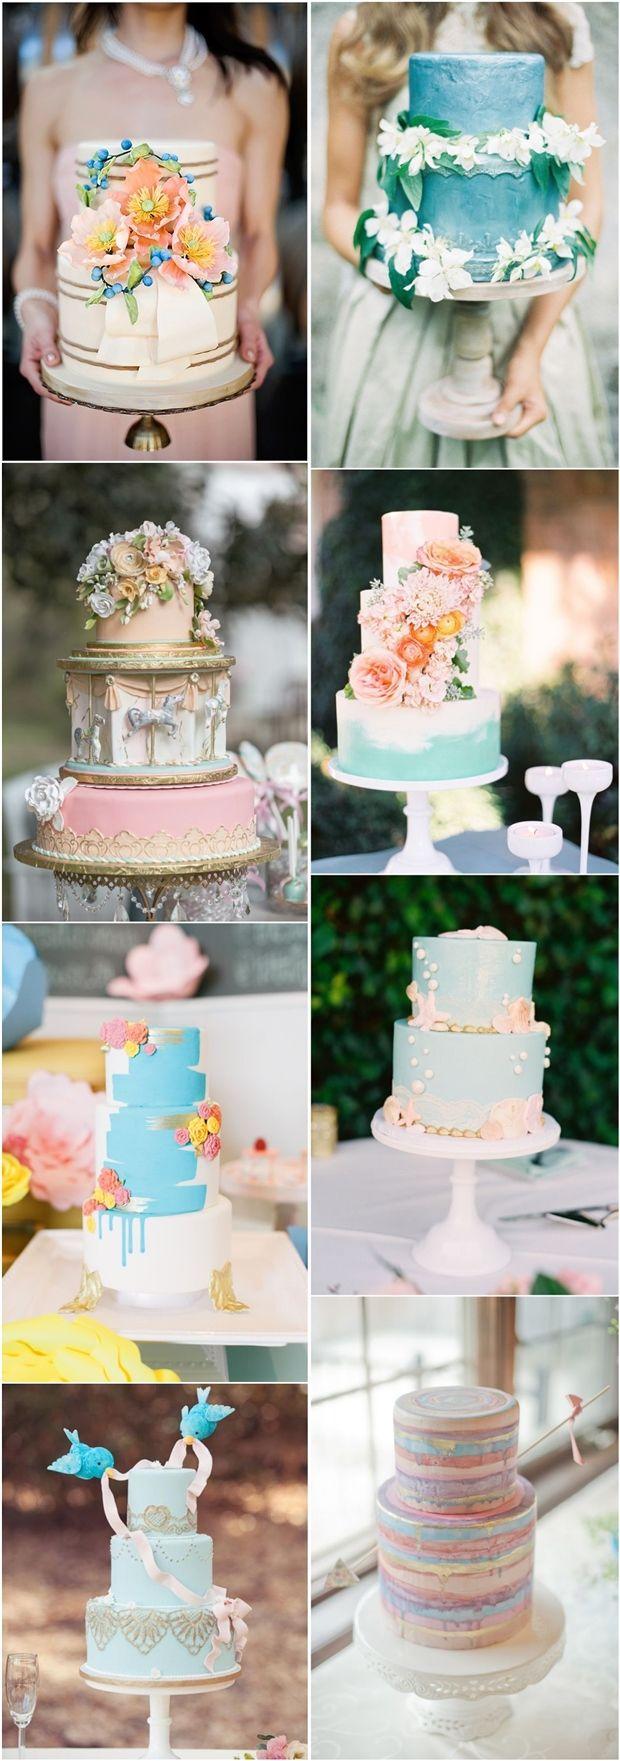 Best 25+ Whimsical wedding cakes ideas on Pinterest ...